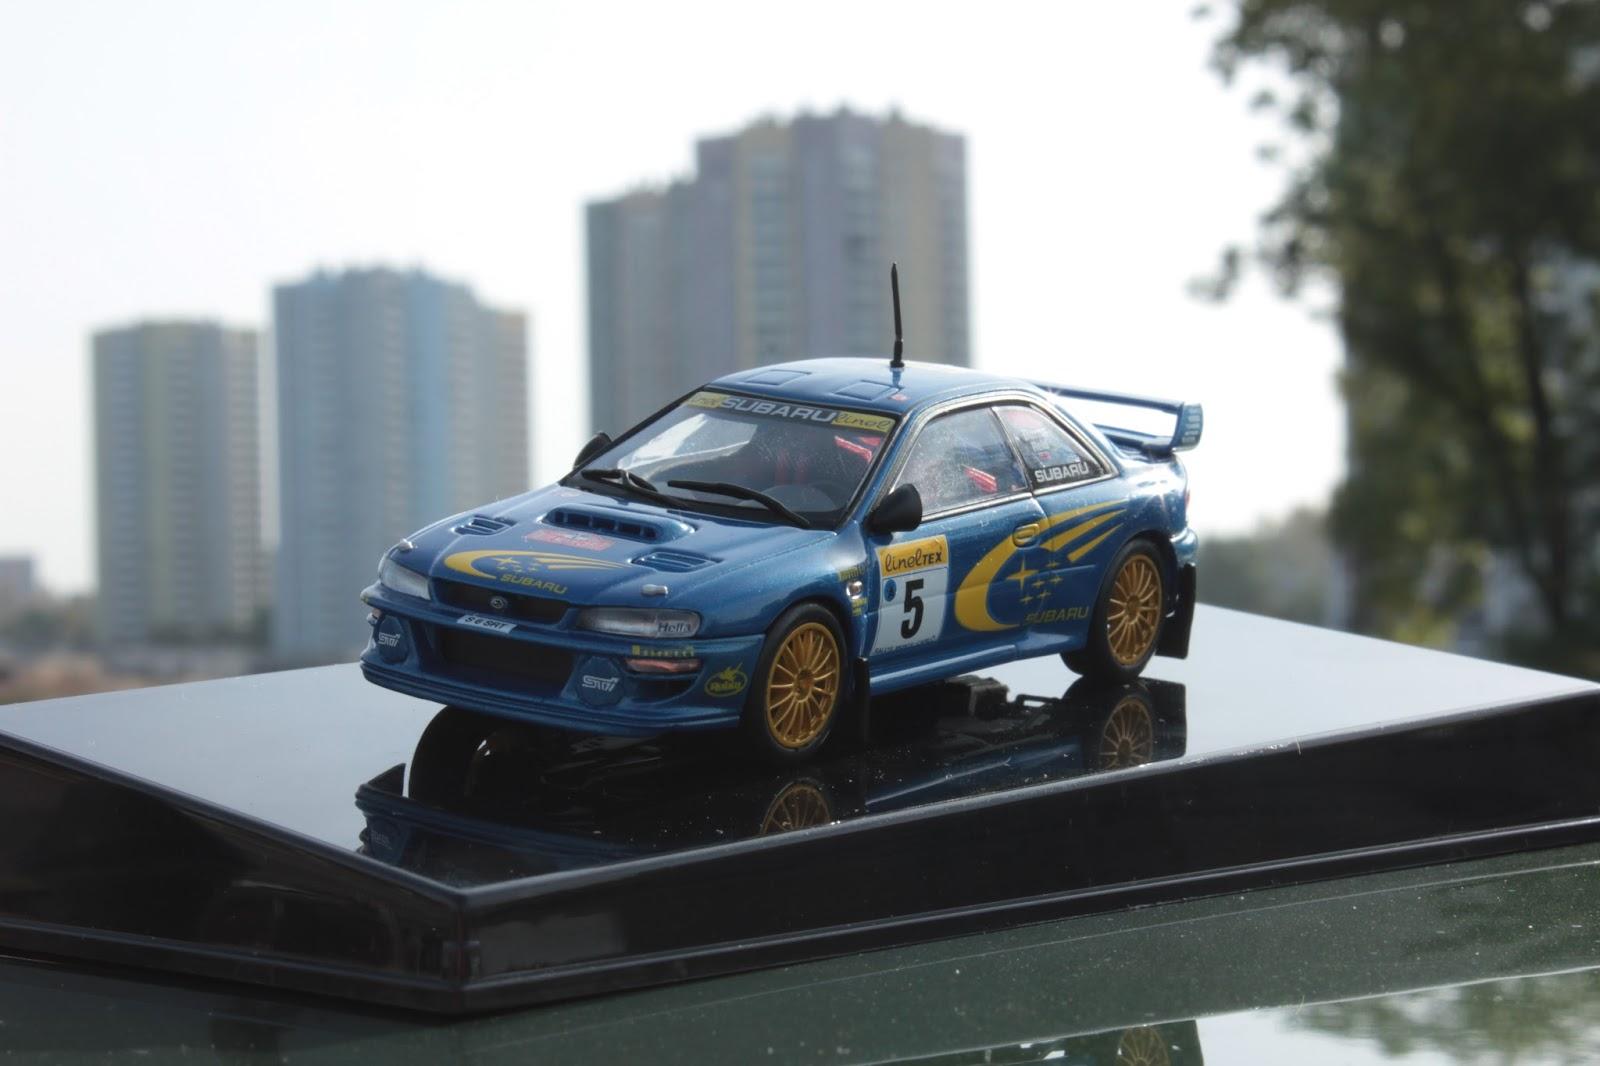 AUTOart Subaru Impreza 22b WRC